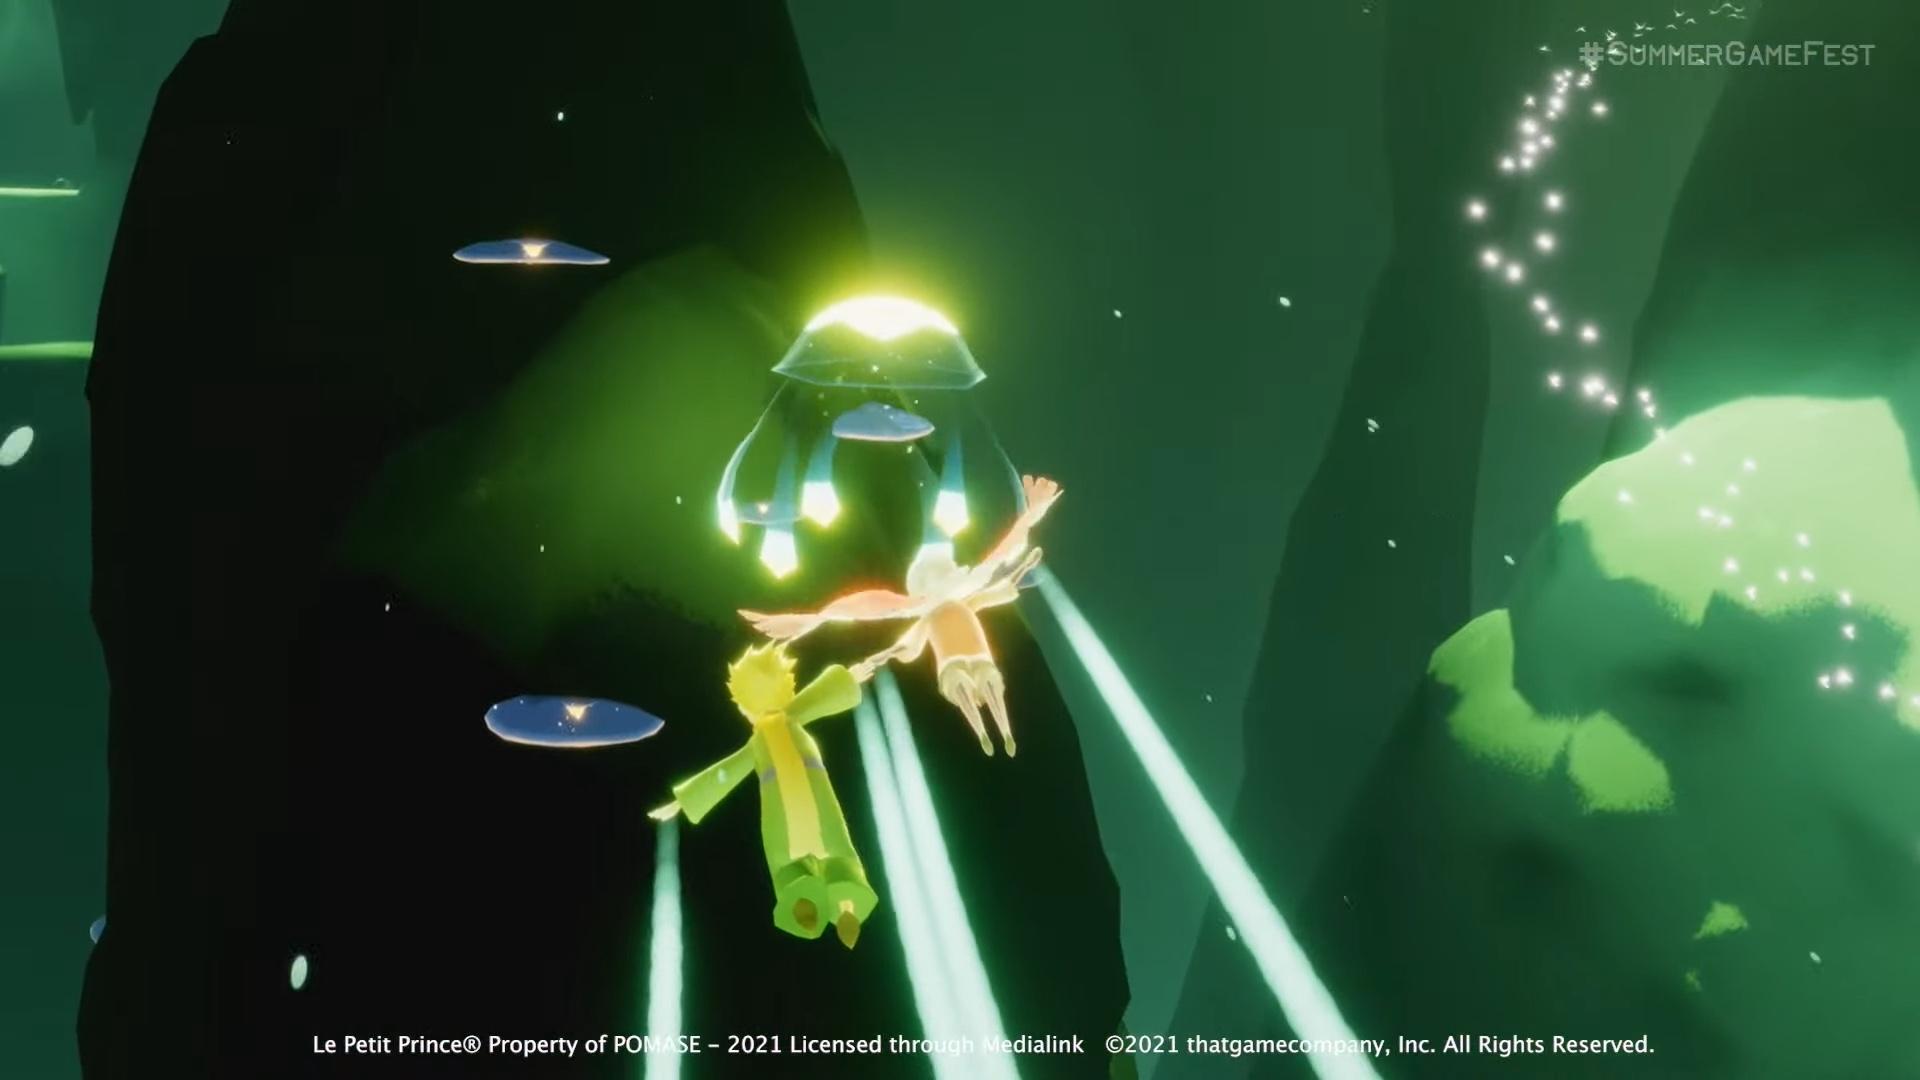 《Sky 光·遇》Switch版6月底上市,《风之旅人》开发商治愈新作